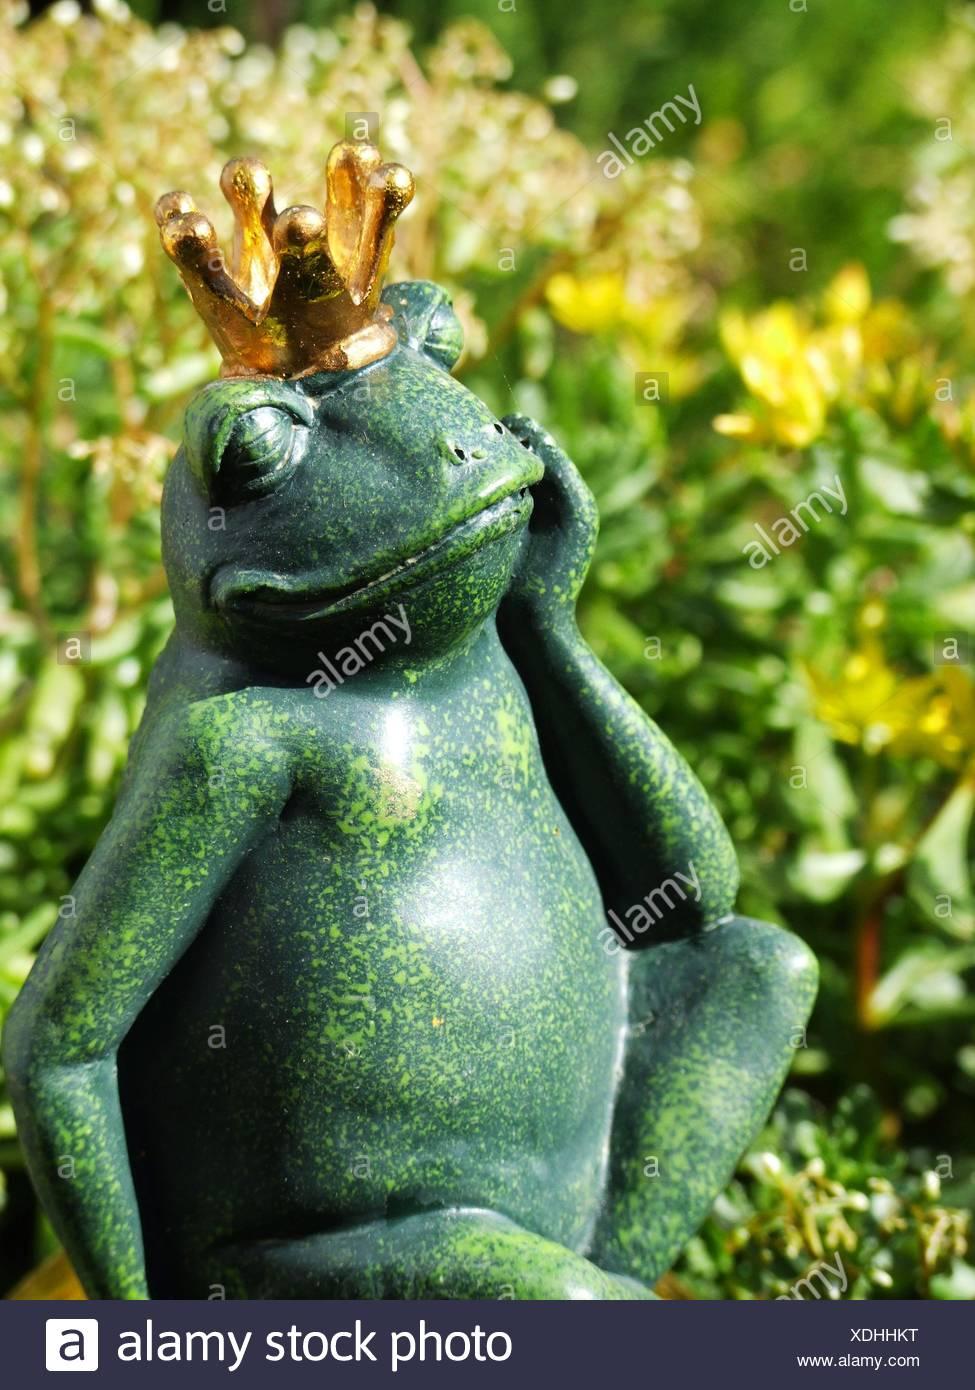 frog prince,fairytale character - Stock Image